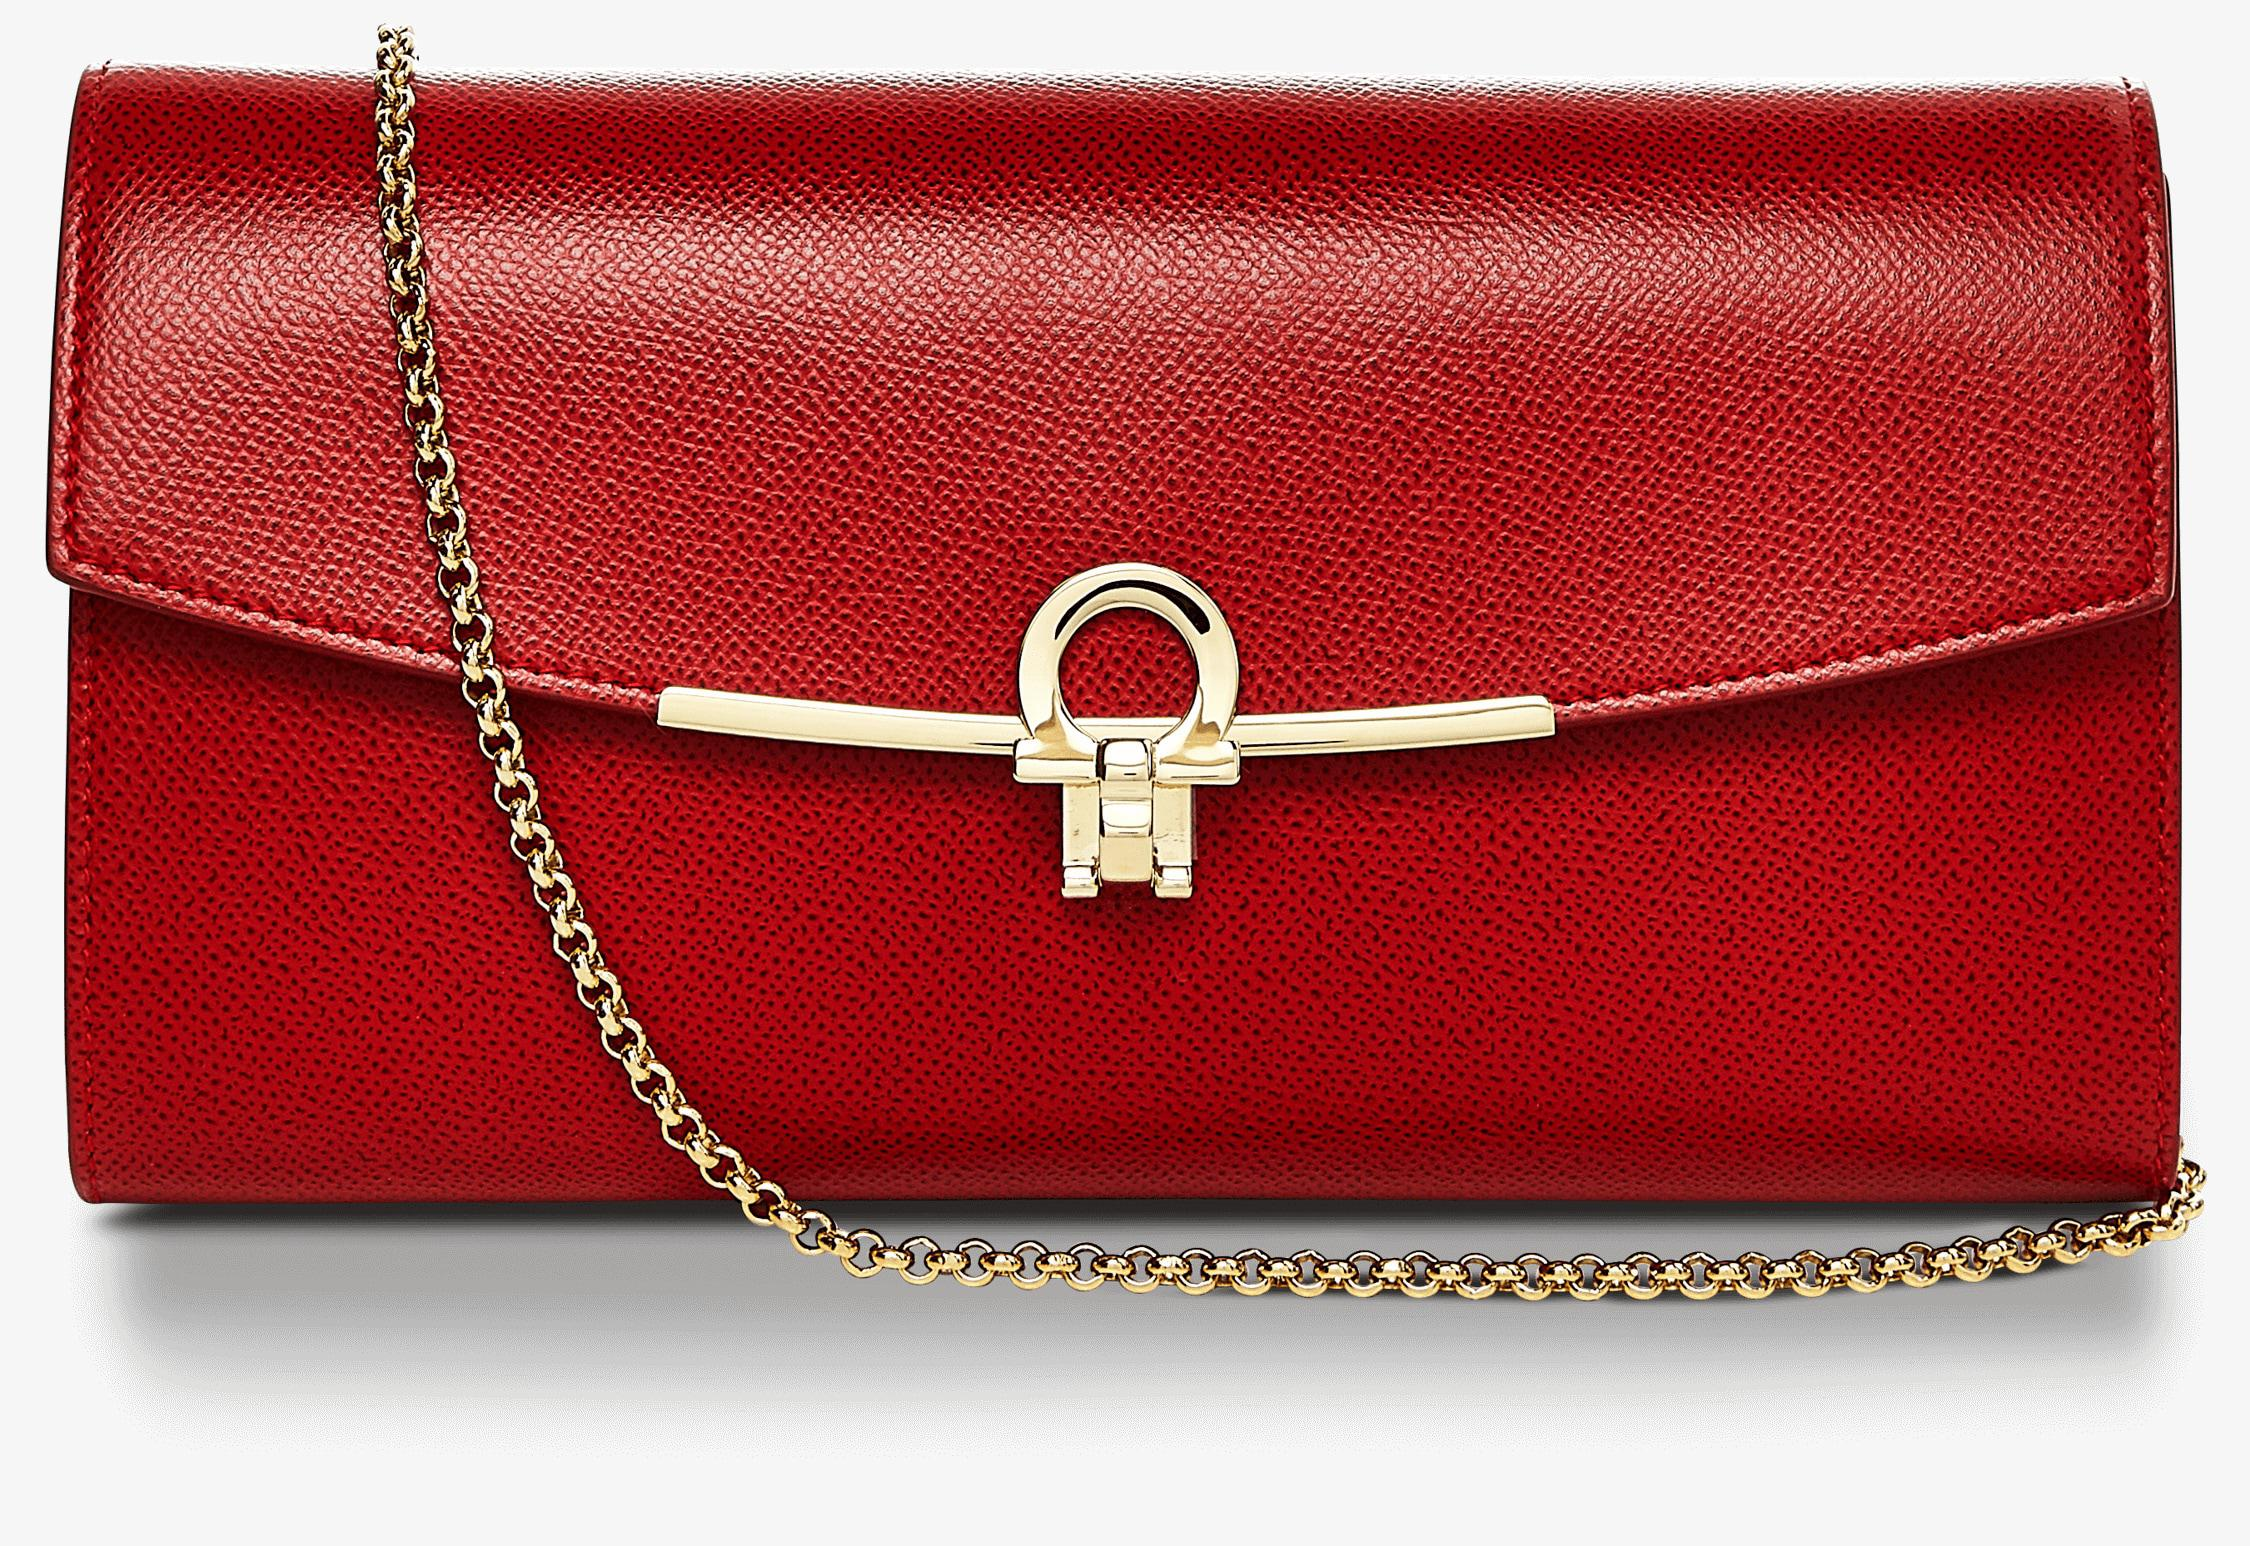 d66ec3db8a Lyst - Ferragamo Mini Gancini Bag in Red